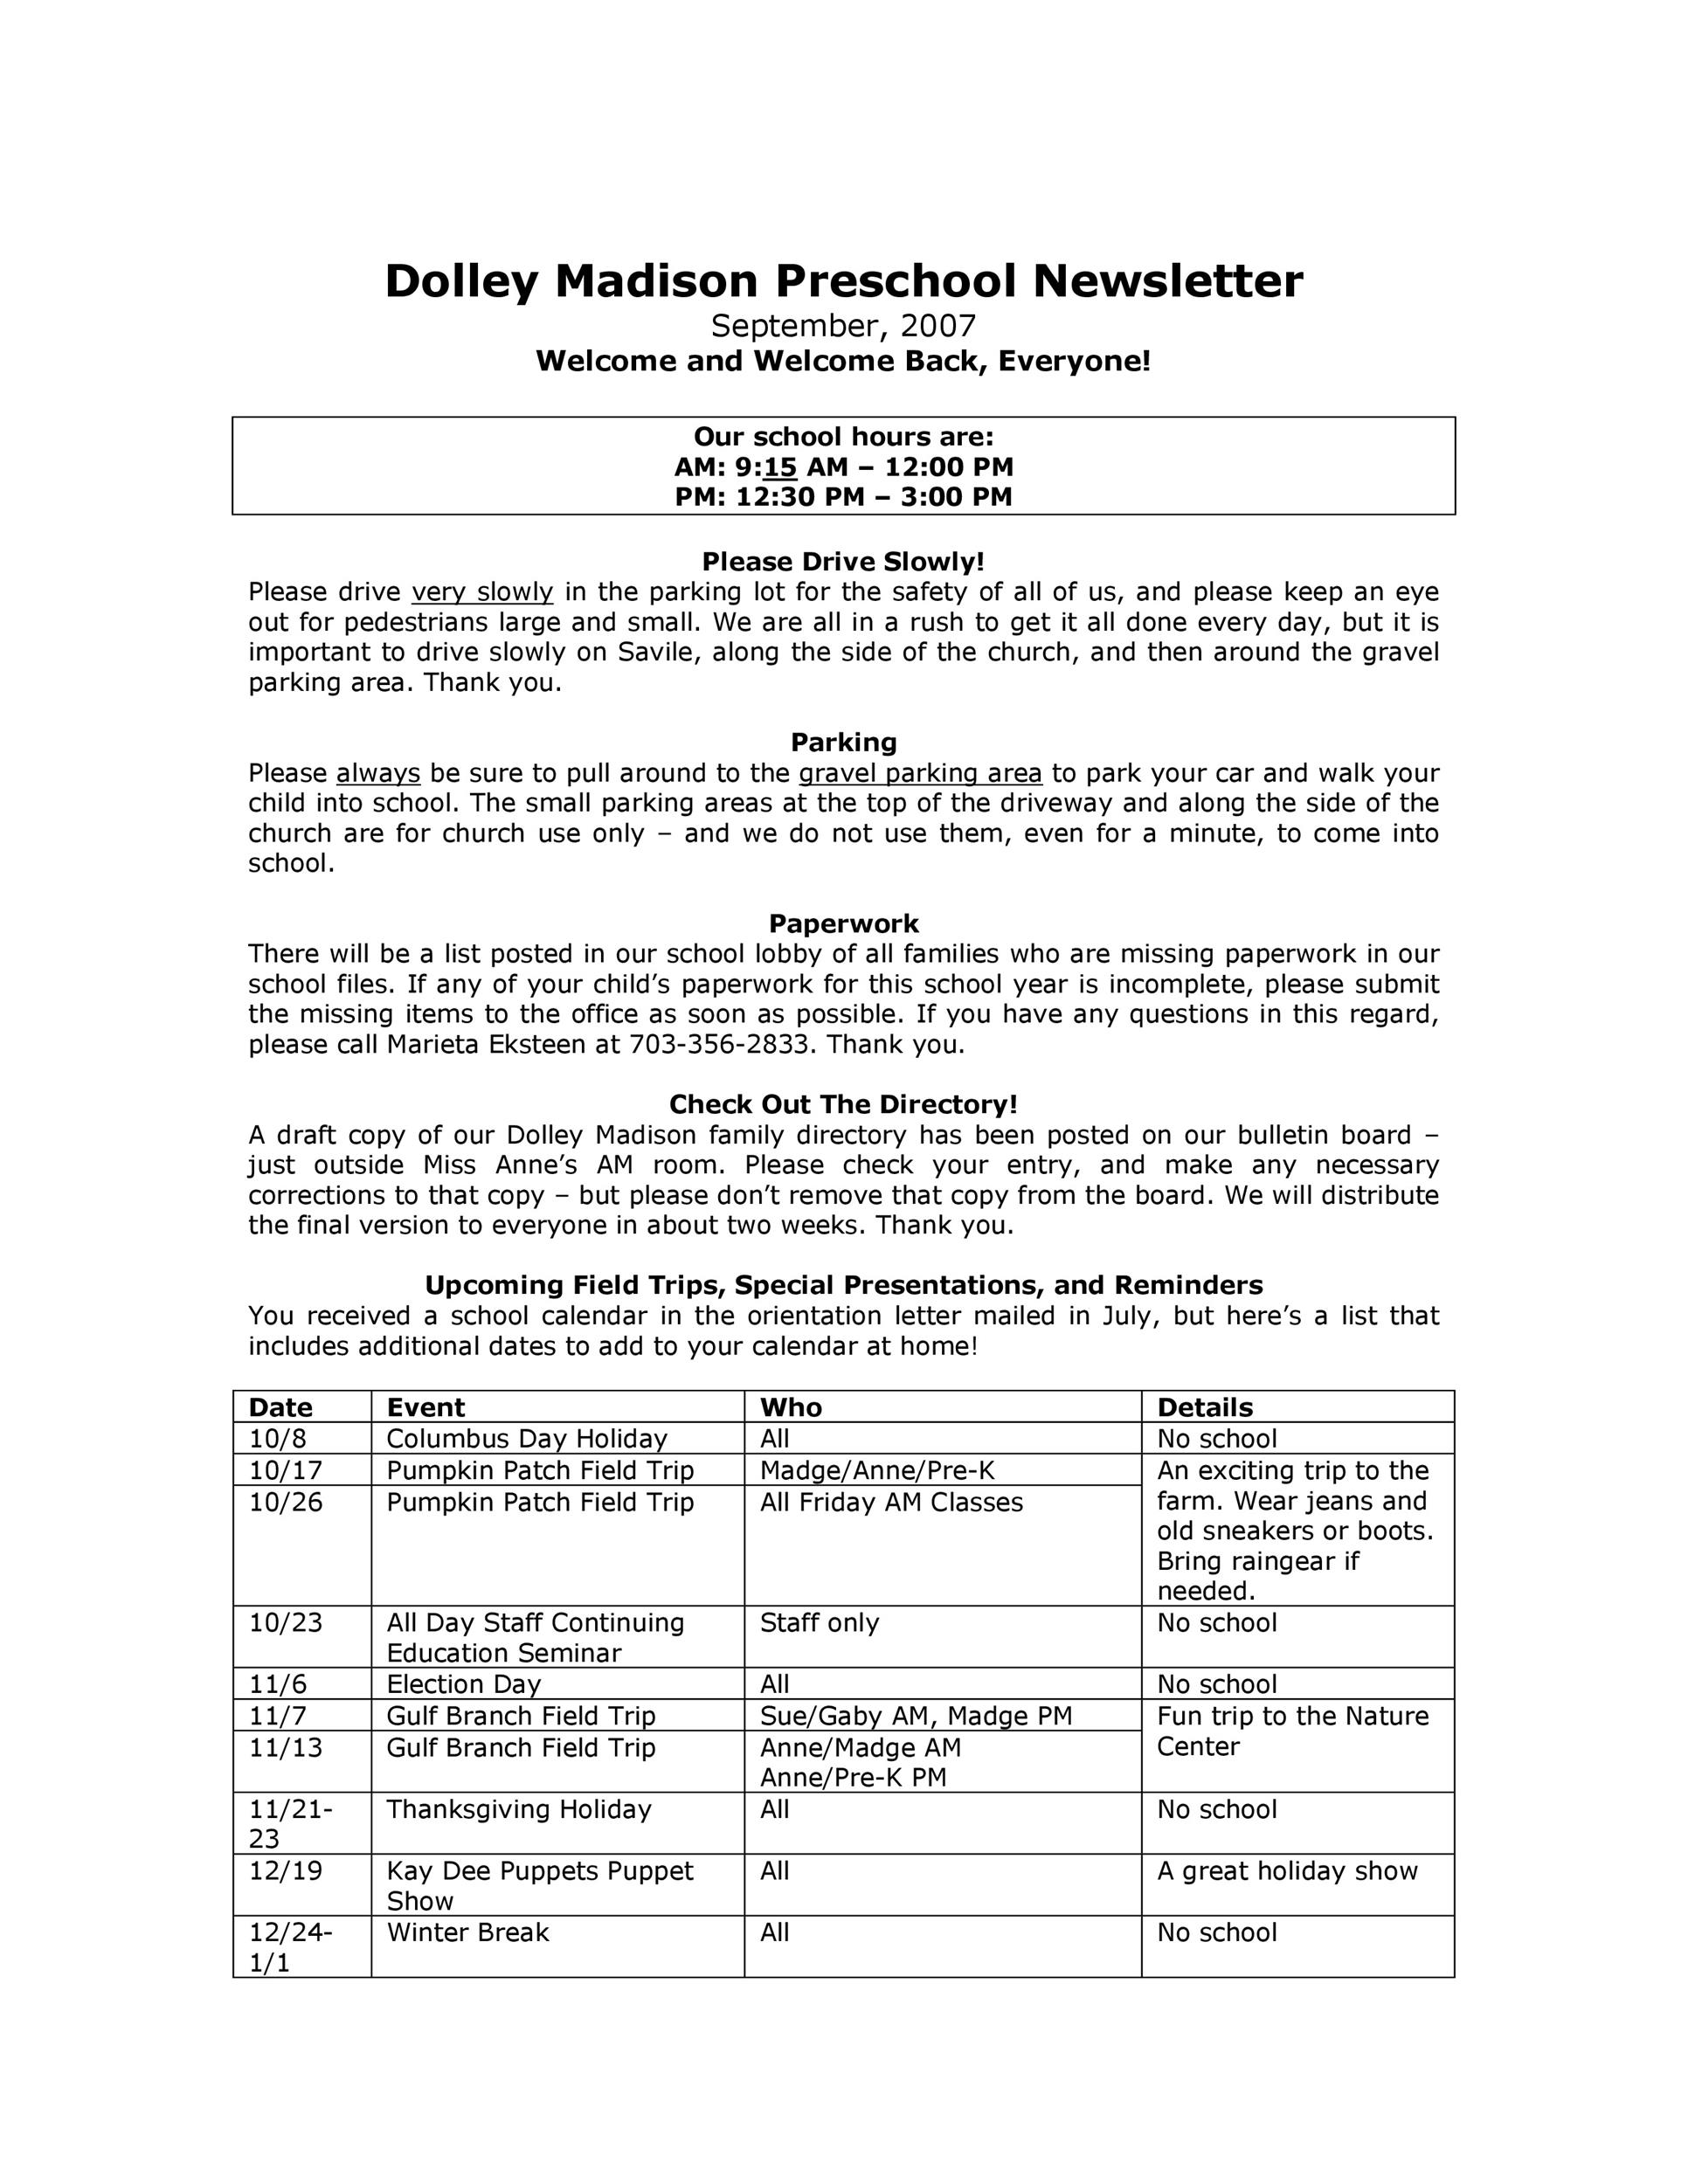 Free preschool newsletter template 25